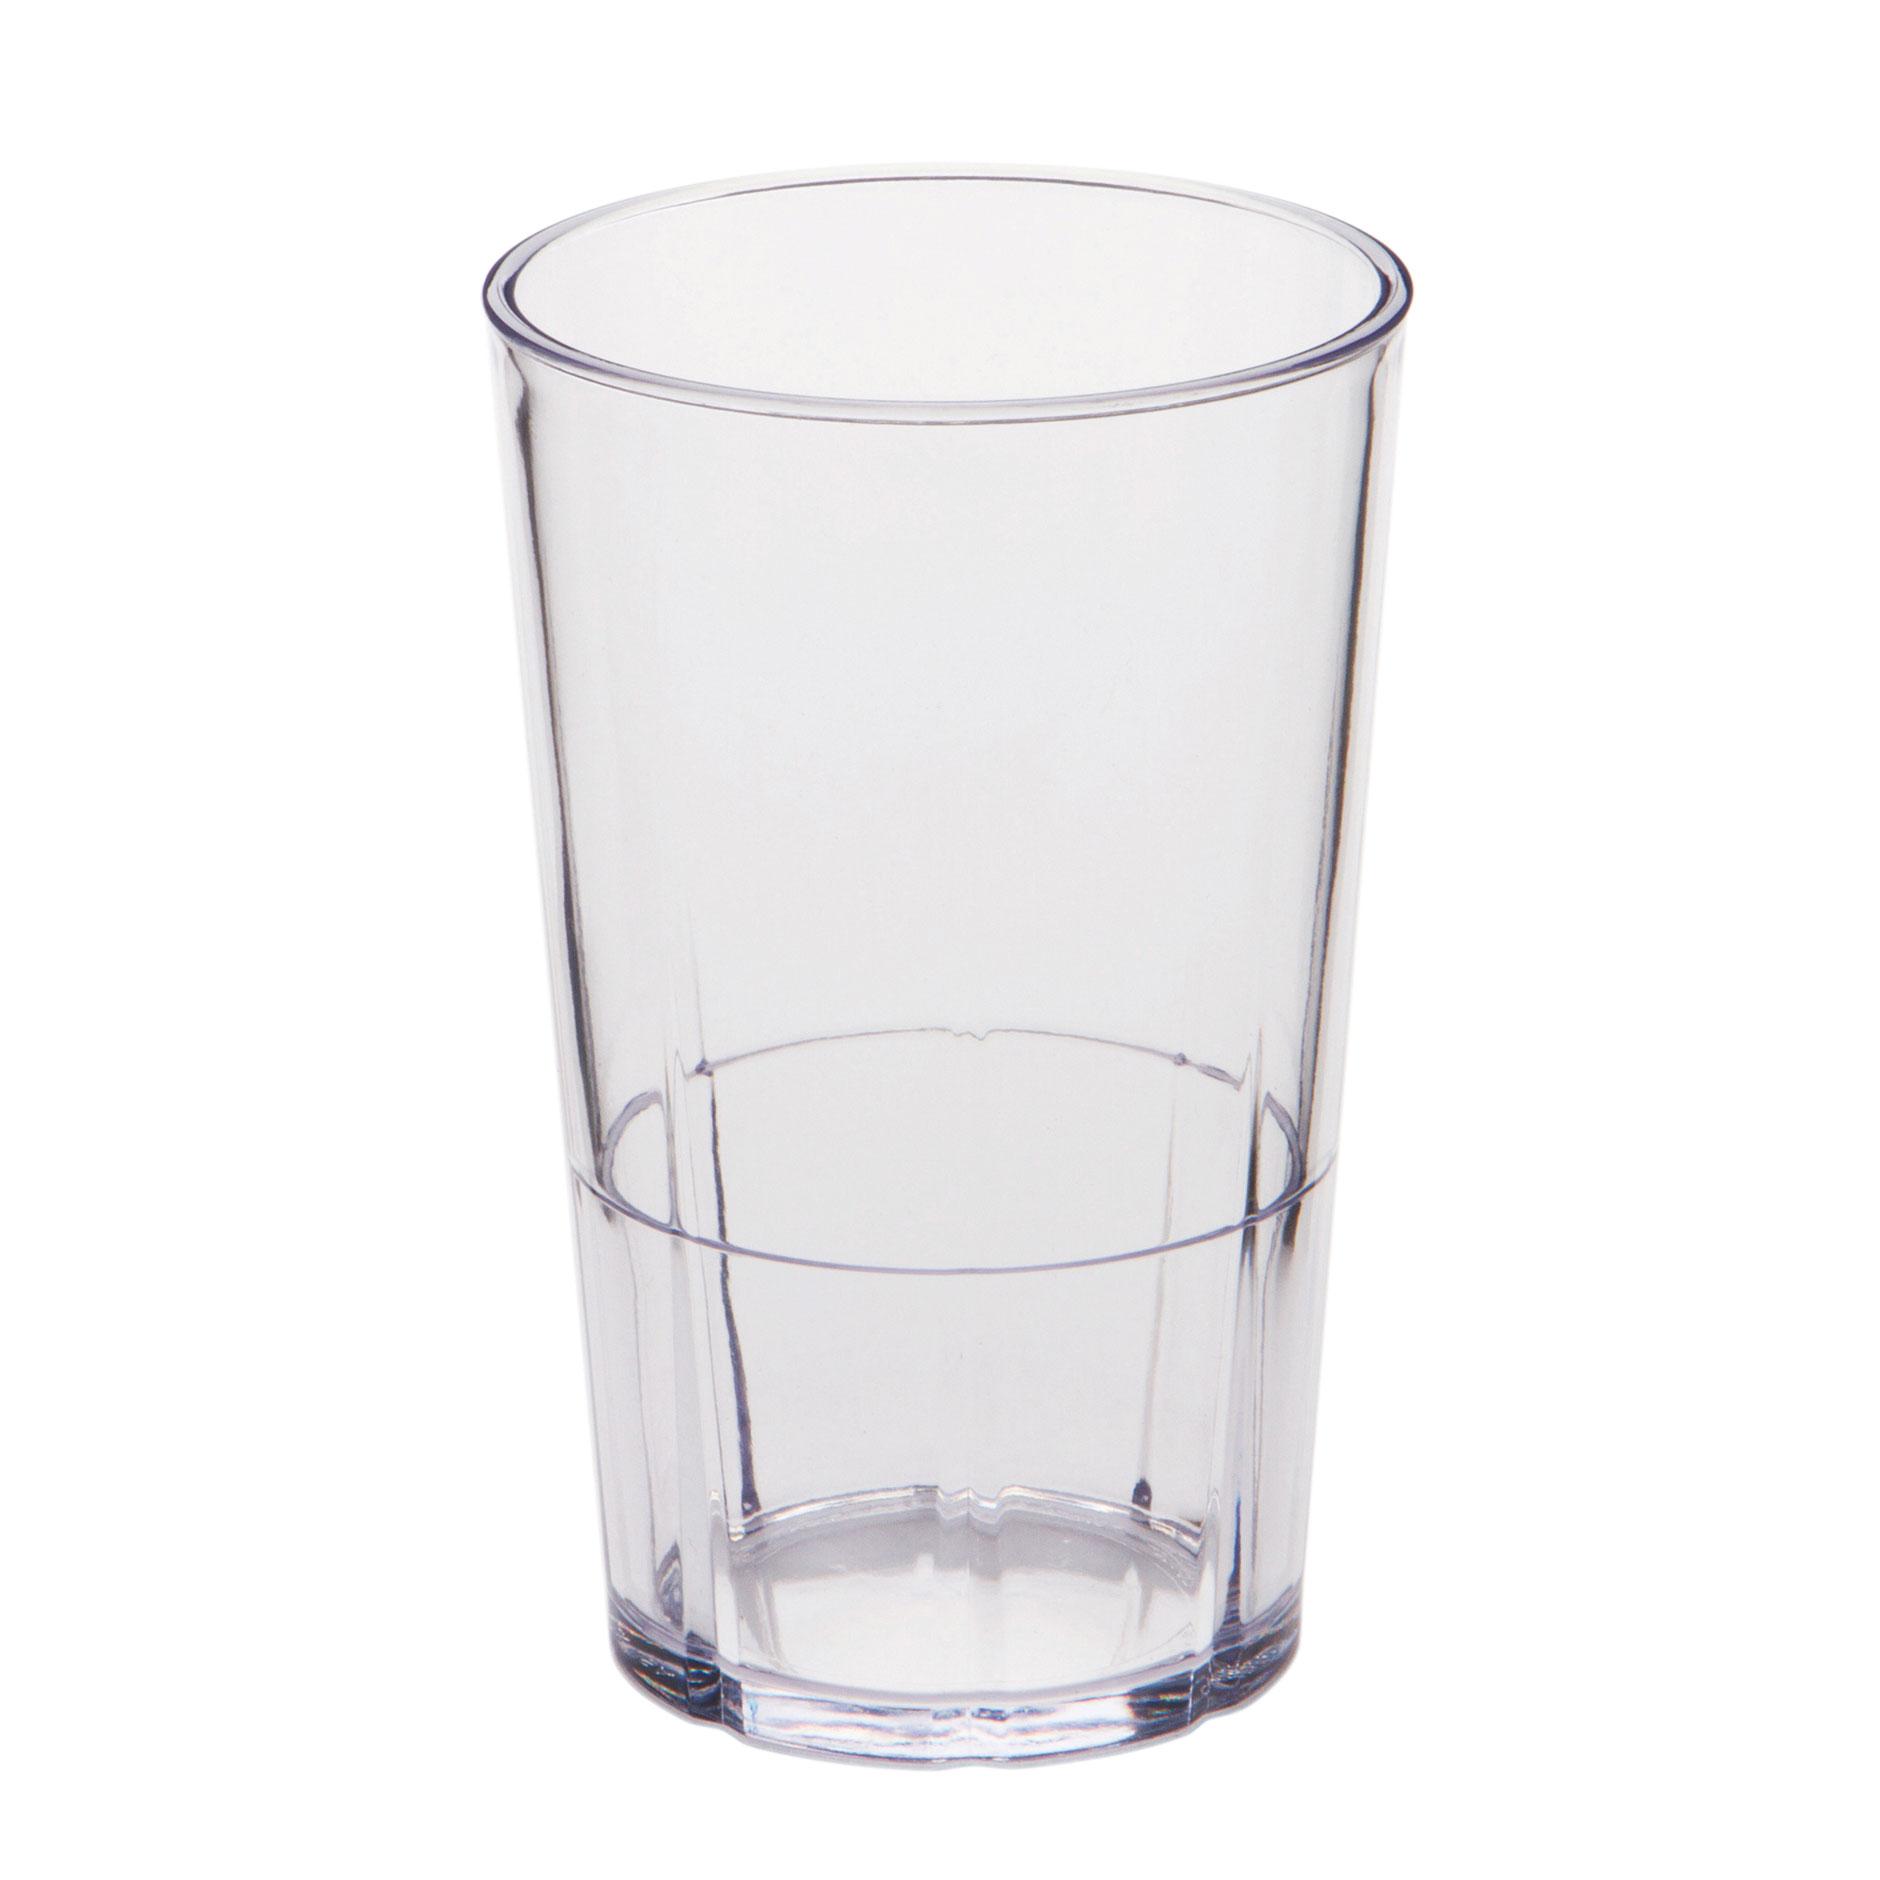 Cambro LDT10152 plastic drinkware